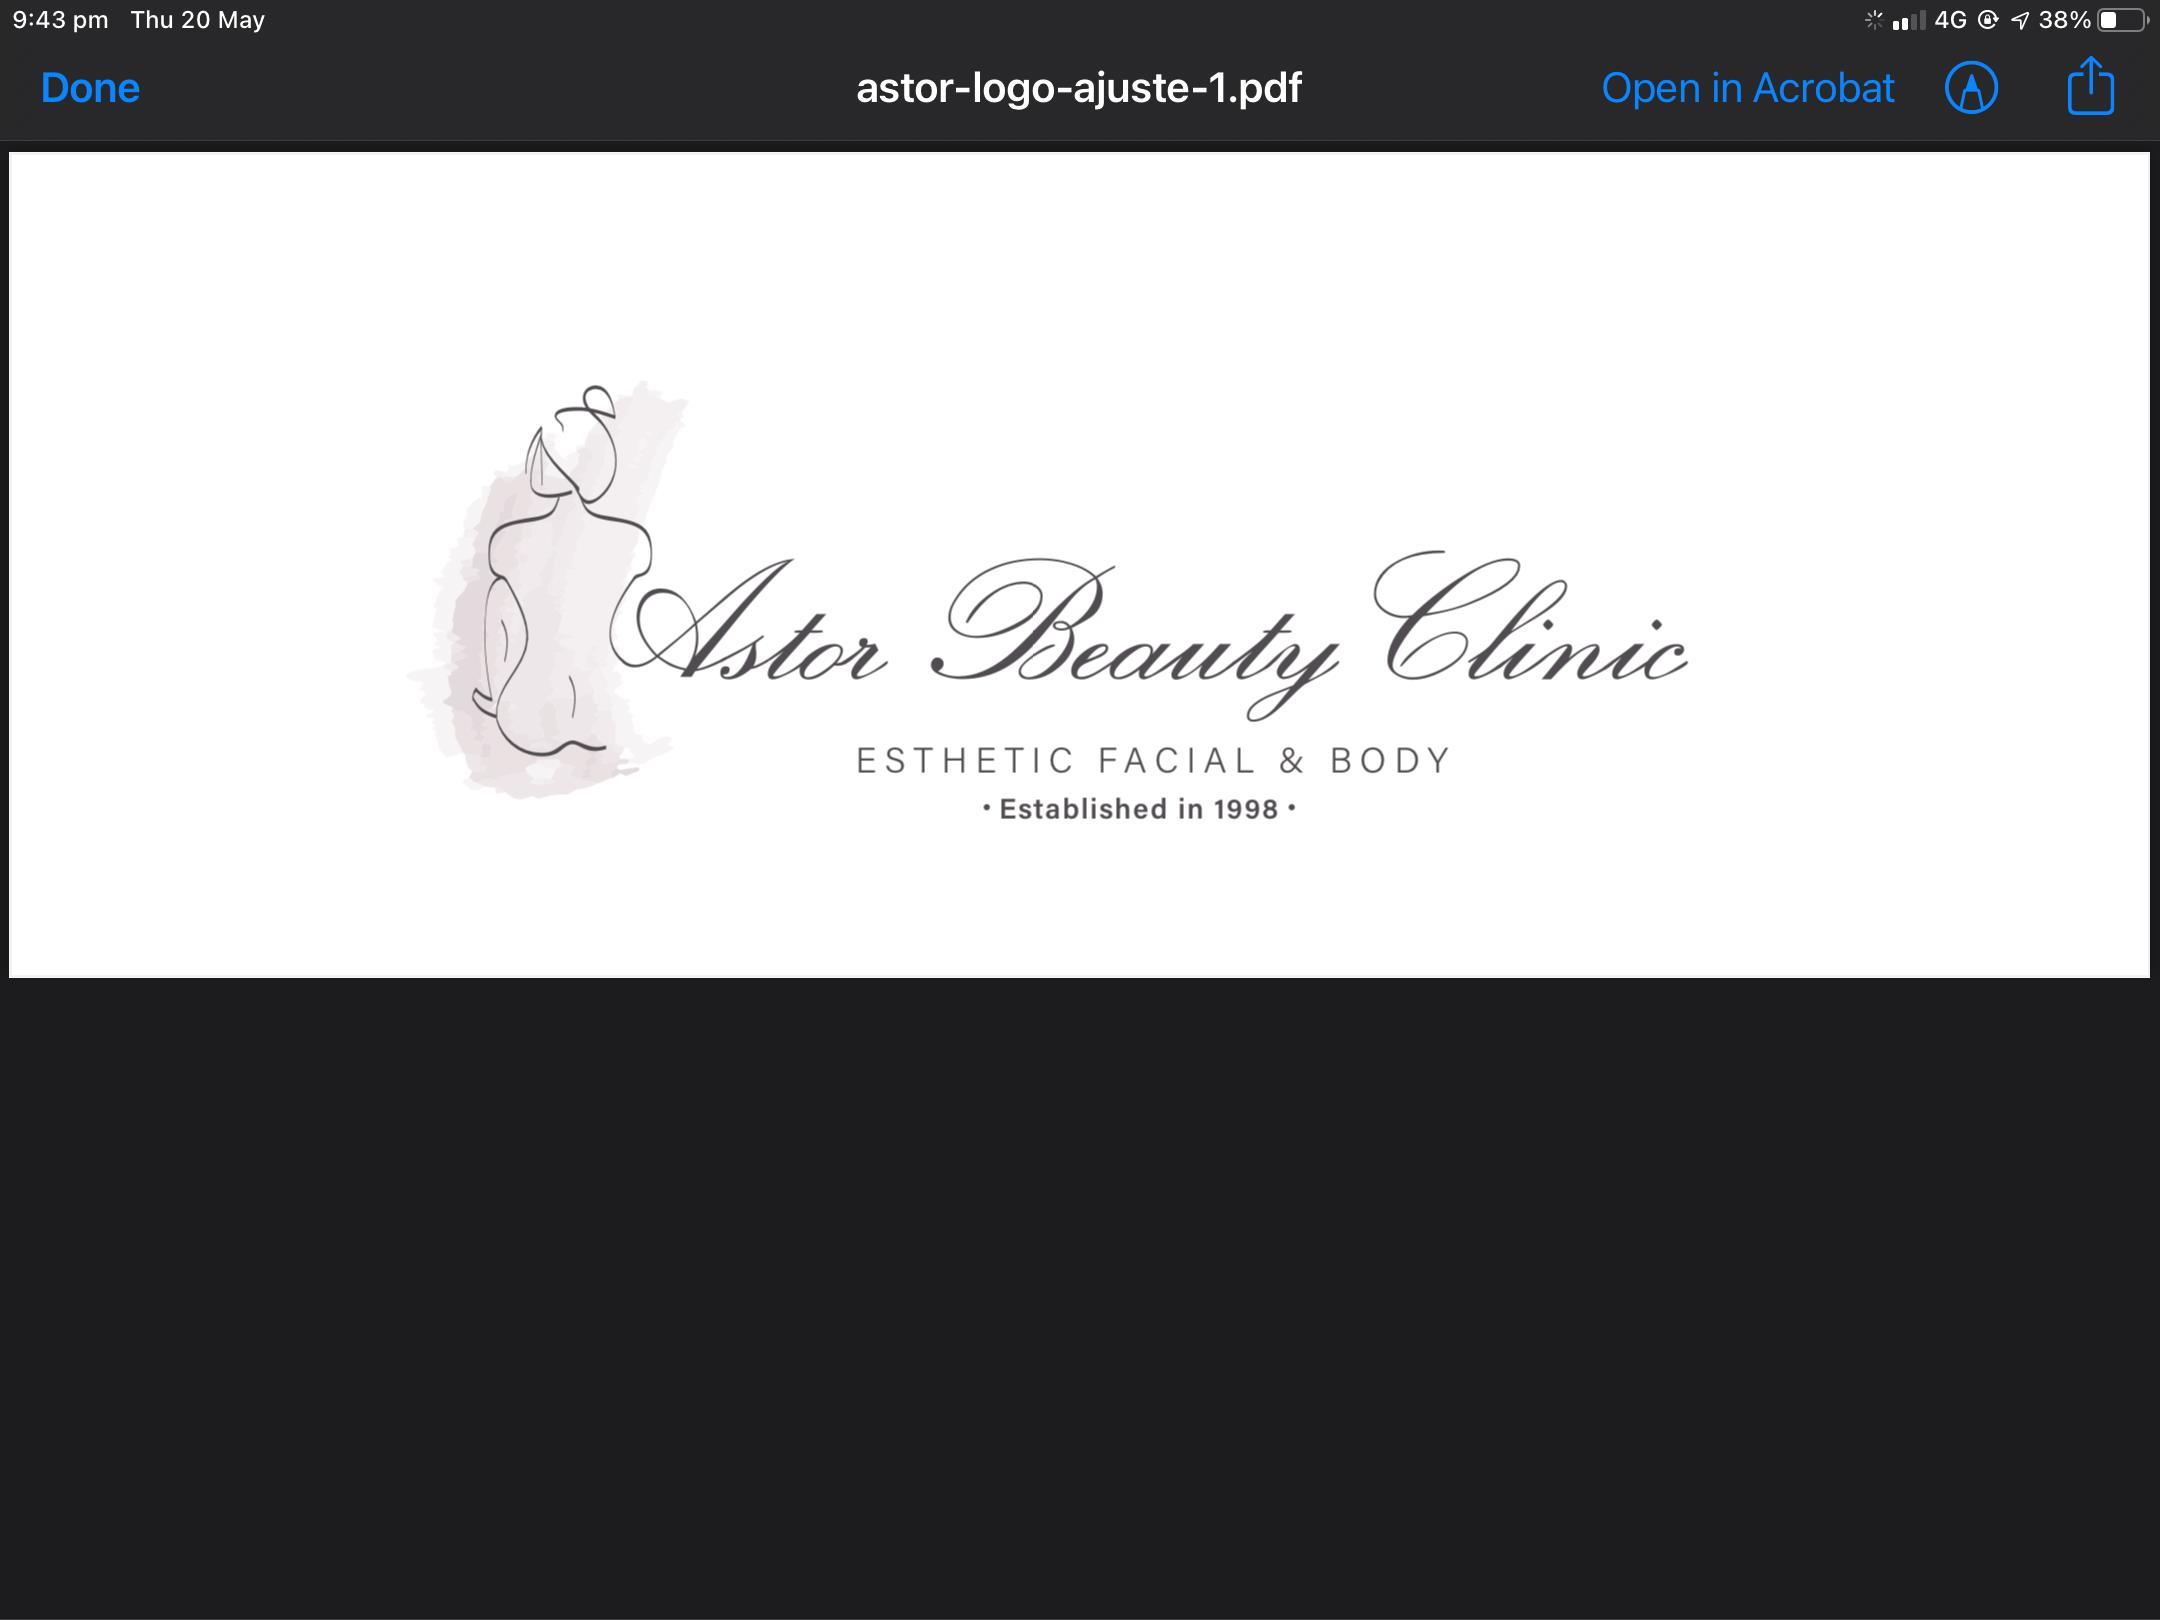 Astor Beauty Clinic